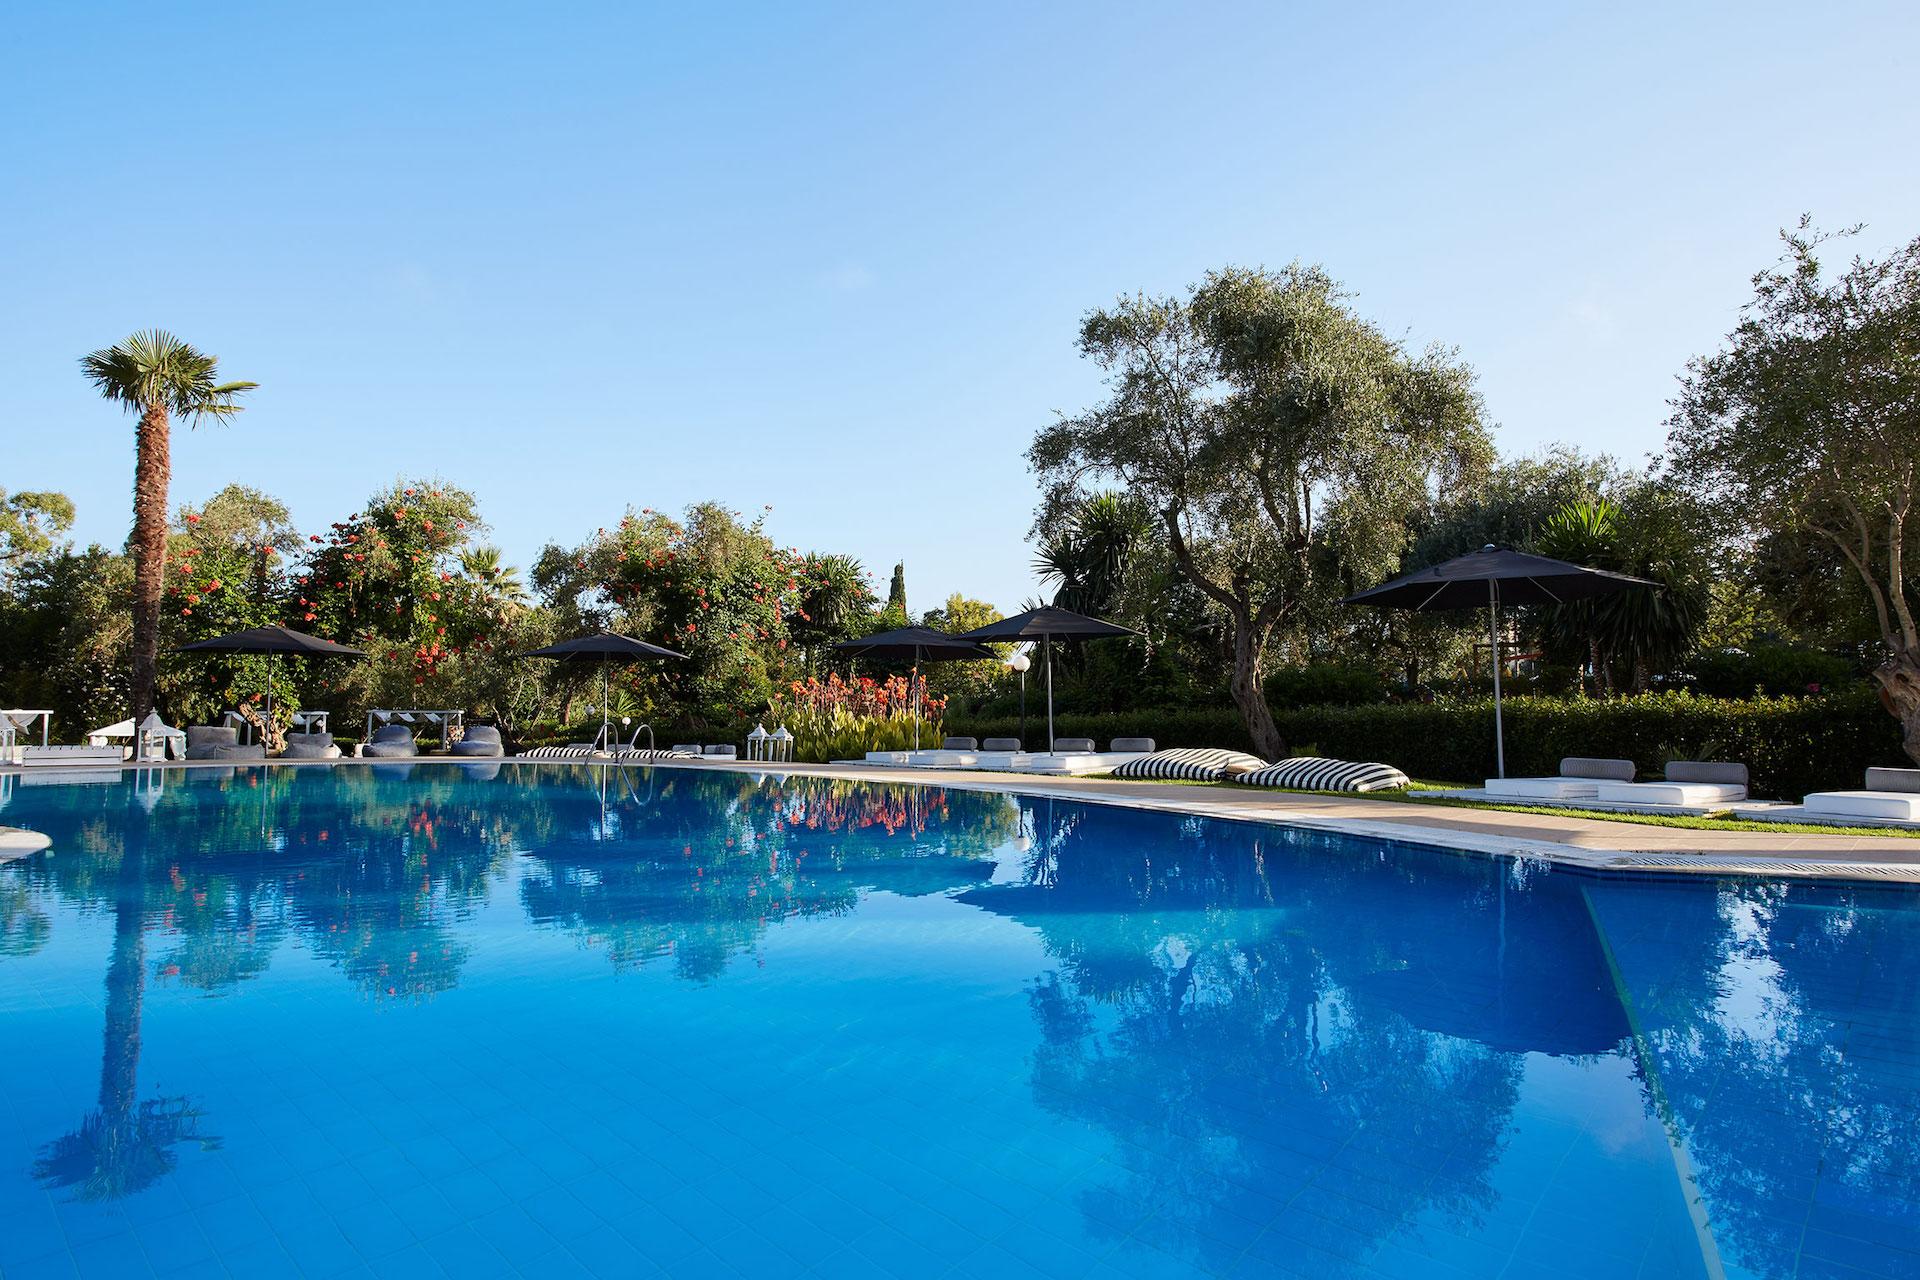 4* Mr & Mrs White Corfu - Κέρκυρα ✦ 4 Ημέρες (3 Διανυκτερεύσεις) ✦ 2 άτομα ✦ Πρωινό ✦ 01/07/2021 έως 31/08/2021 ✦ Κοντά στην παραλία!